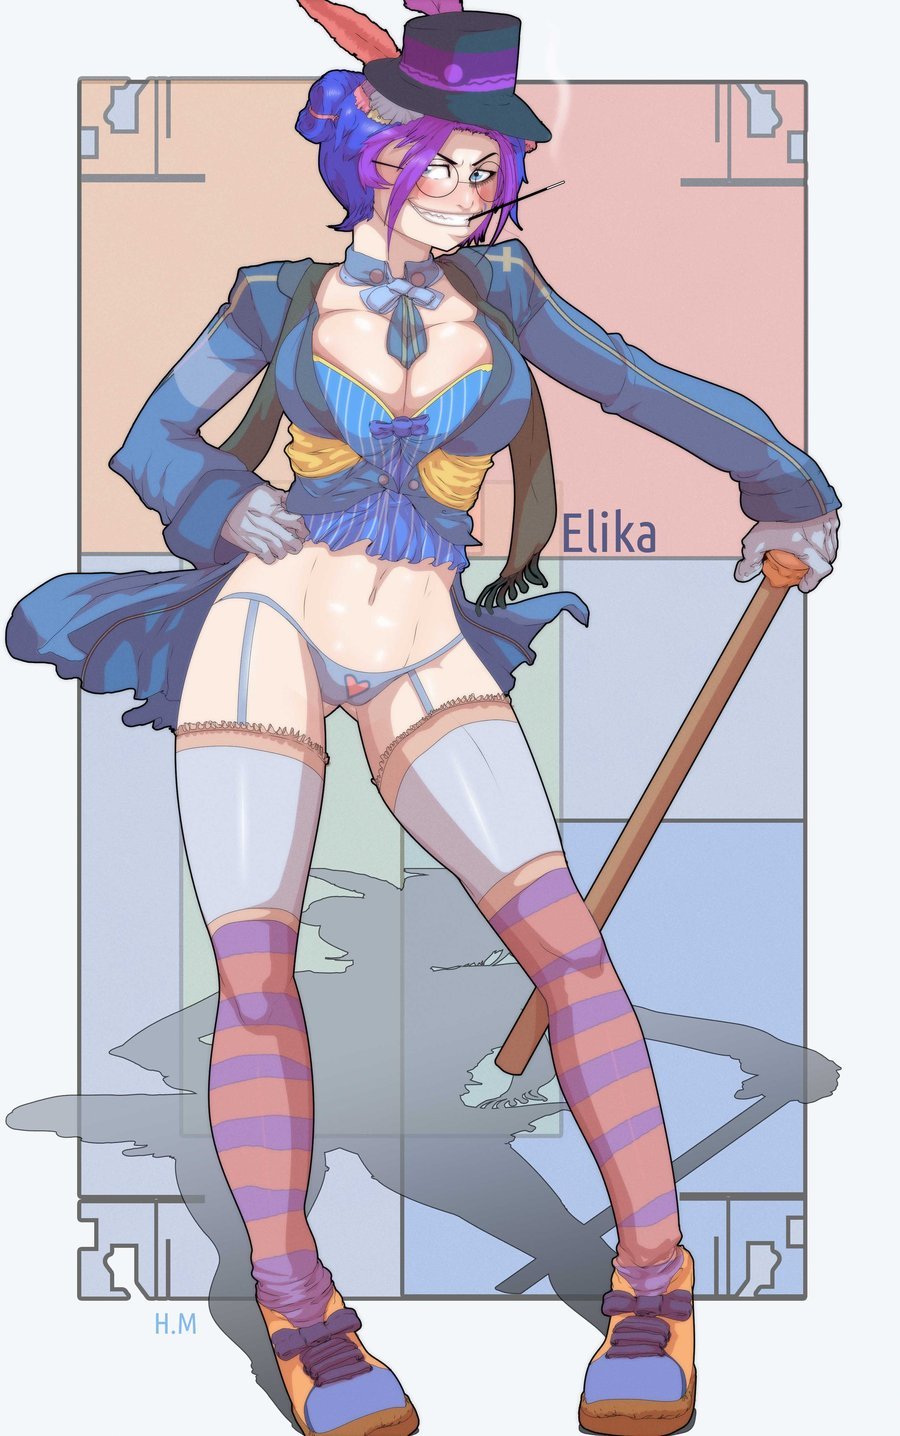 Elika dapper lady